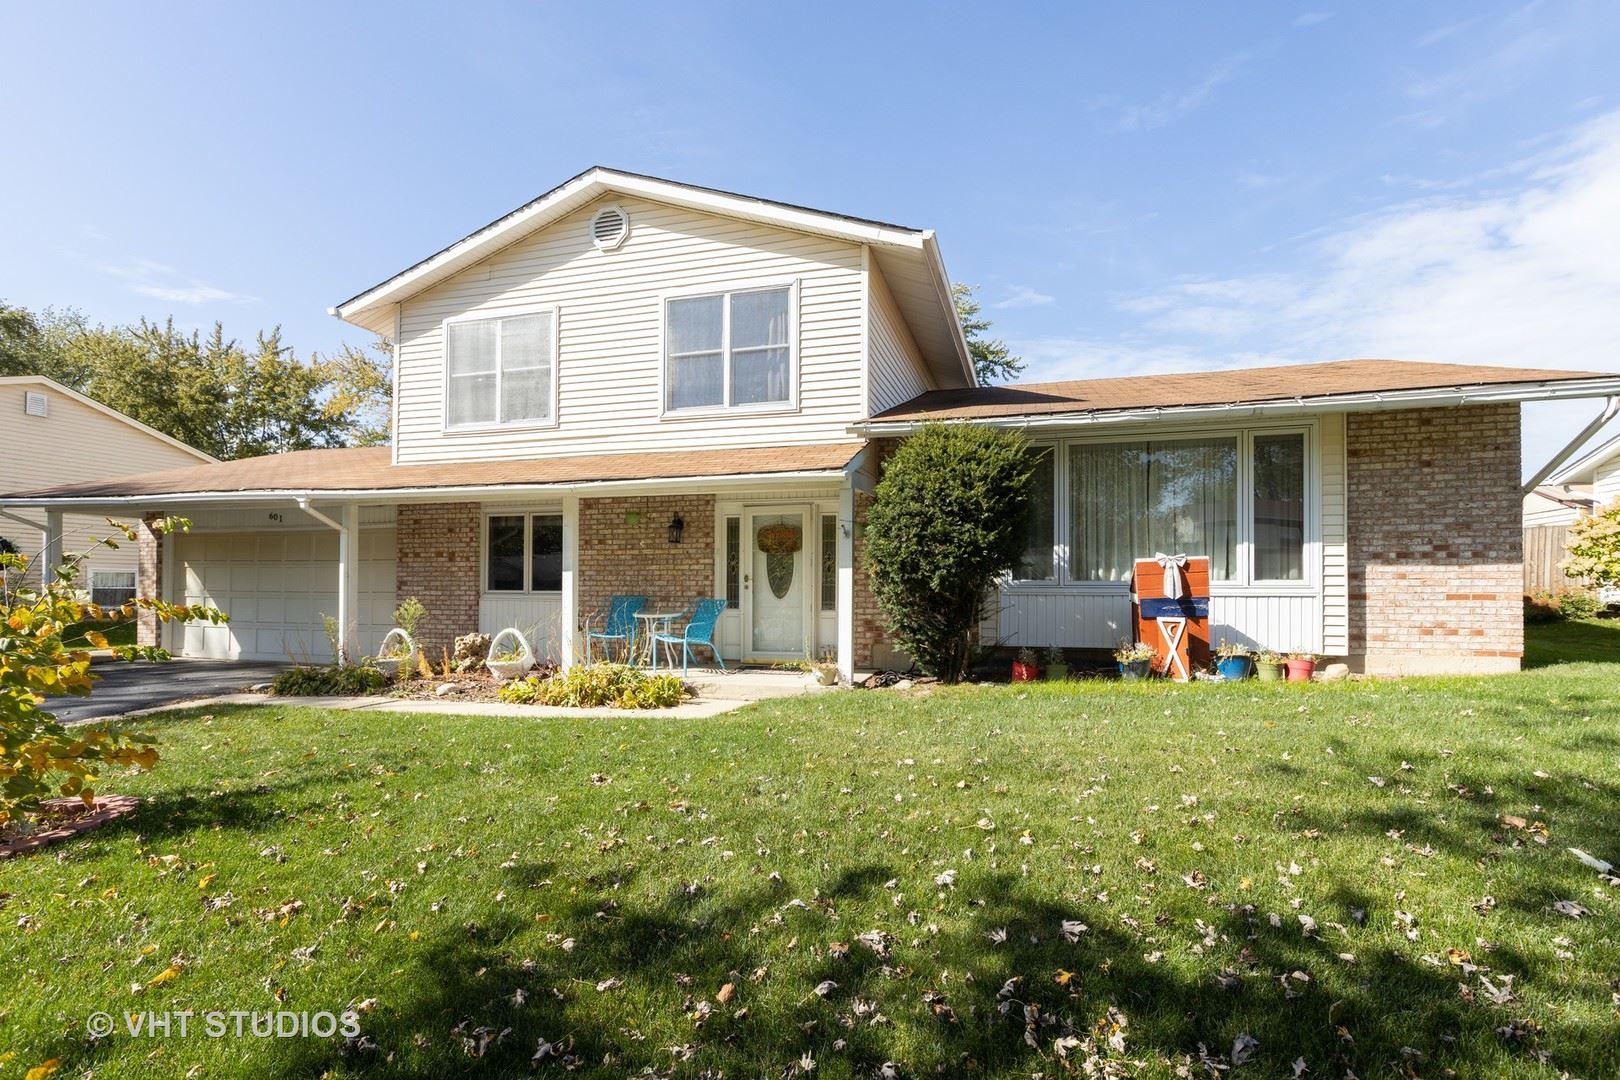 Photo of 601 N Ashbury Avenue, Bolingbrook, IL 60440 (MLS # 10902862)